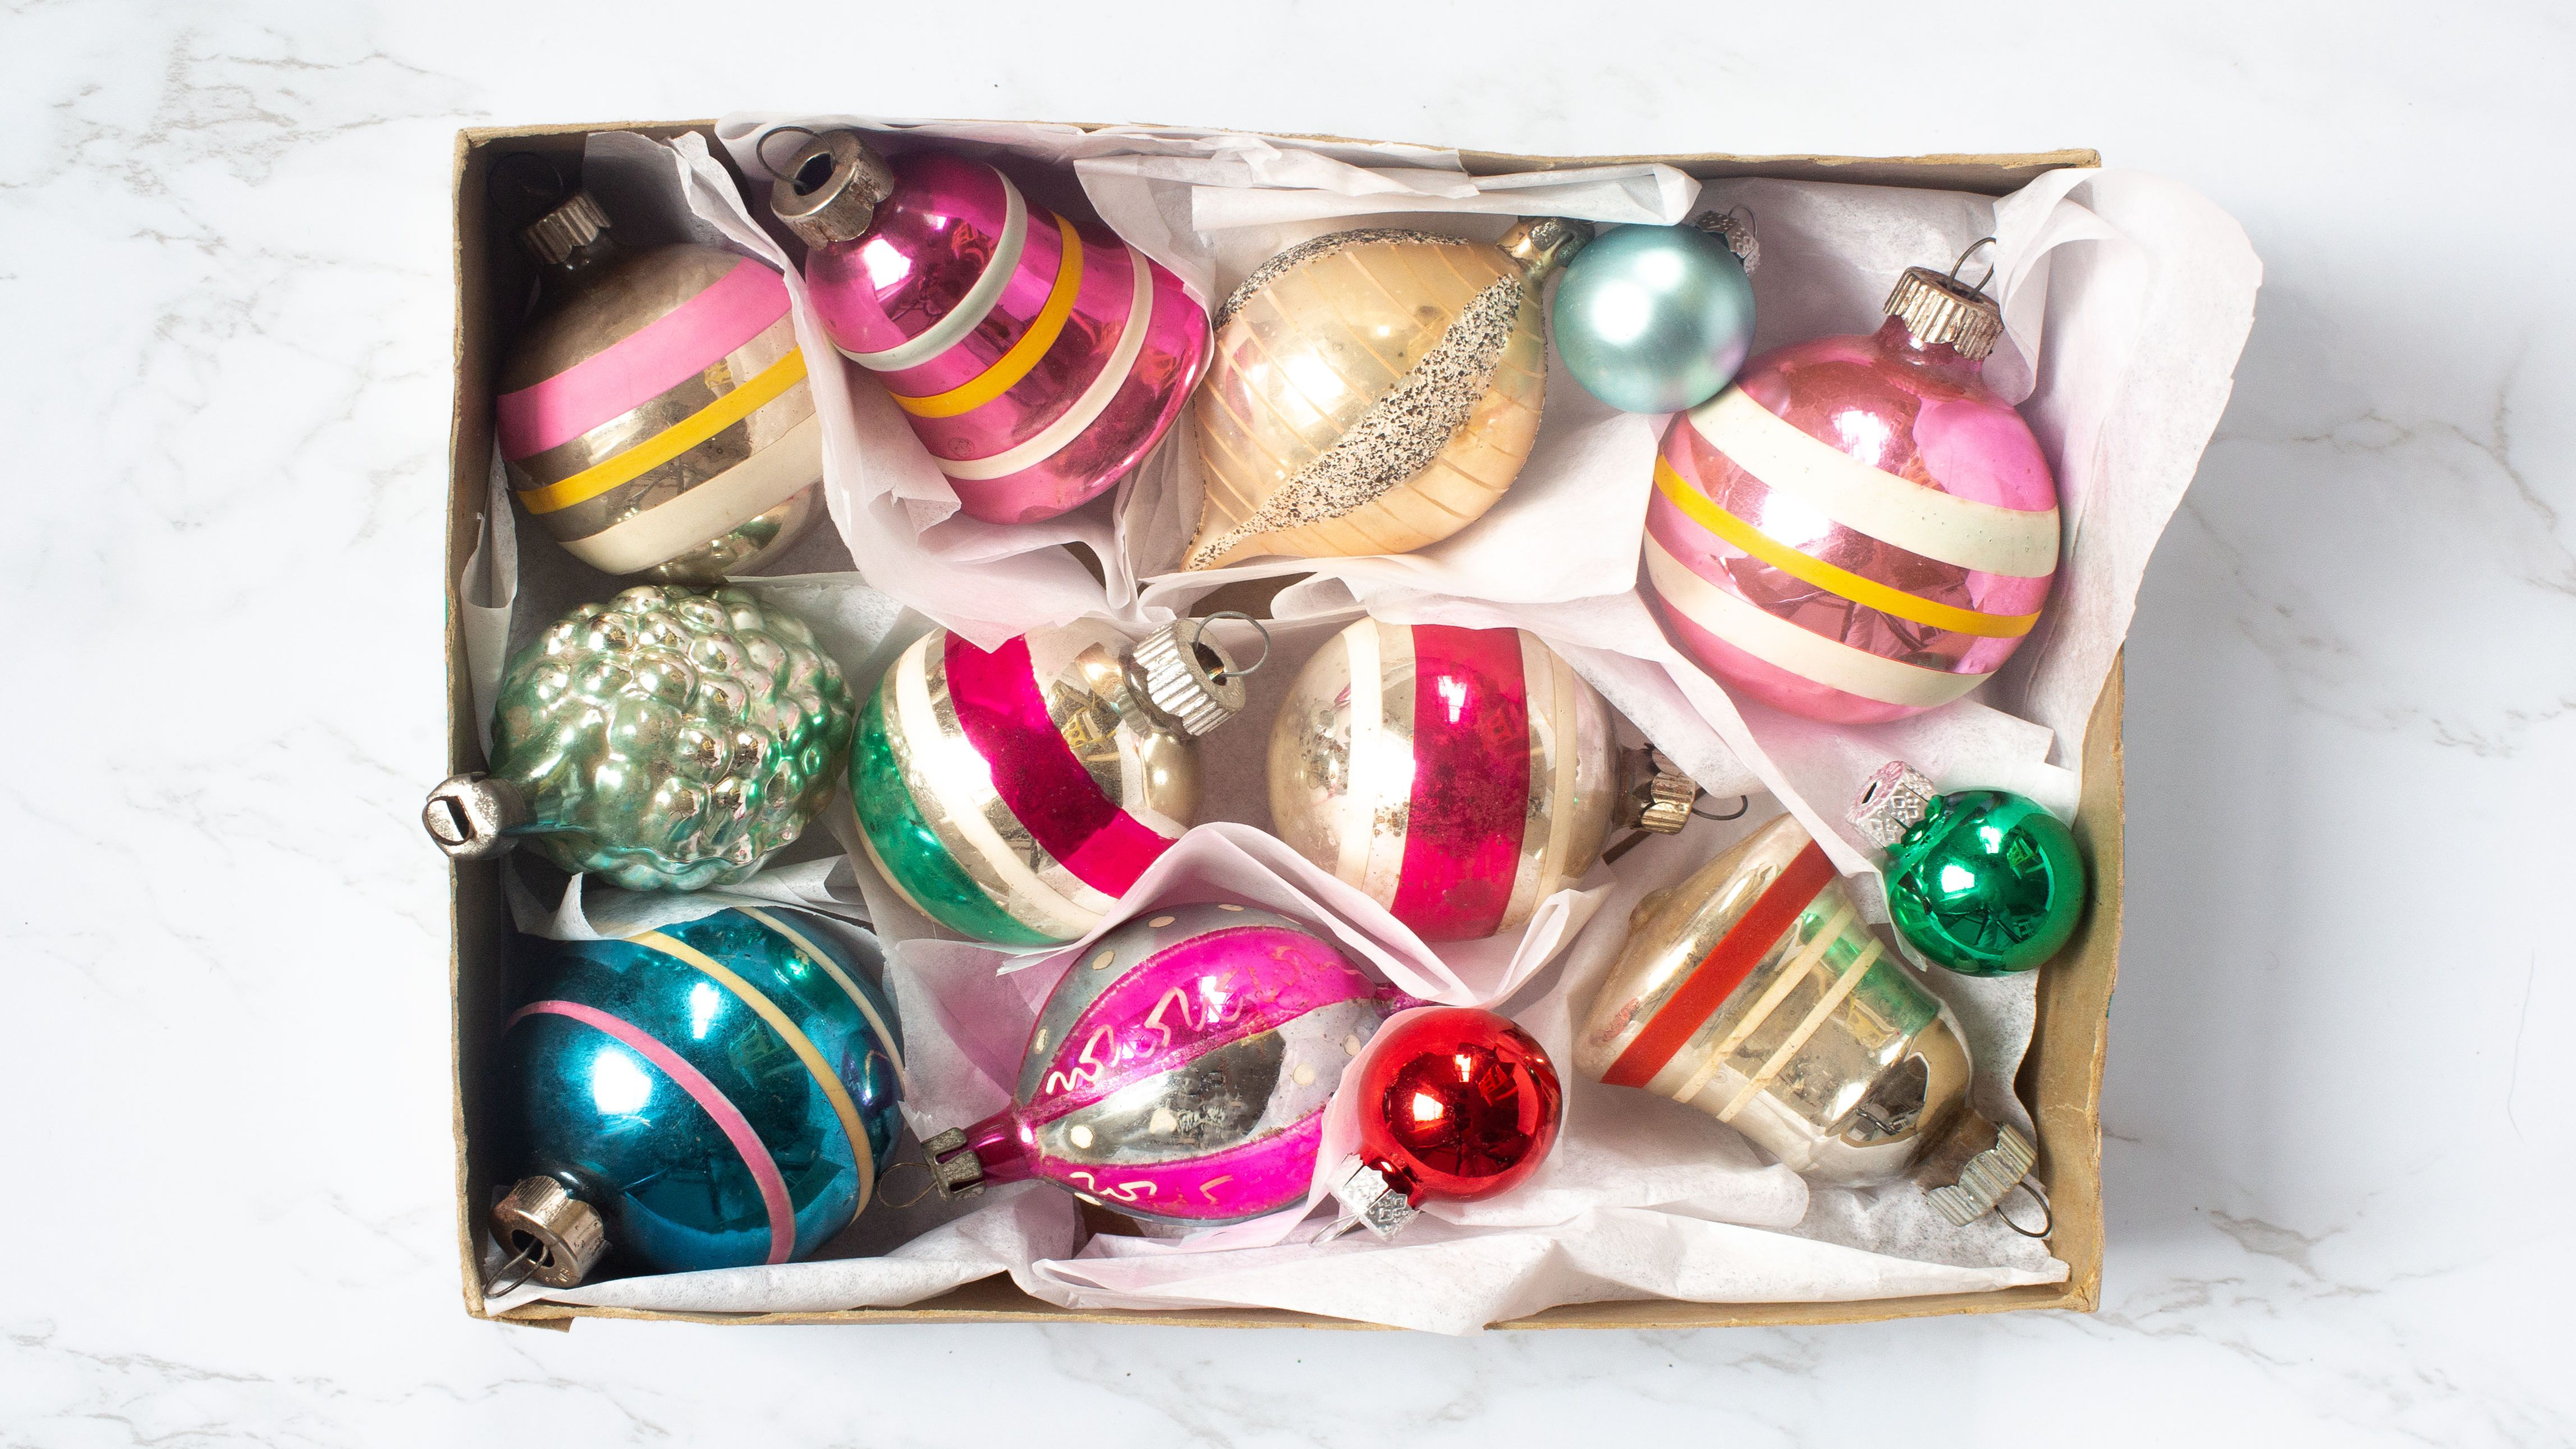 Vintage Yule Gems by Bradford Jewel-shaped Plastic Christmas Ornaments Vintage Christmas Retro Christmas Made in Hong Kong 1960s 1970s